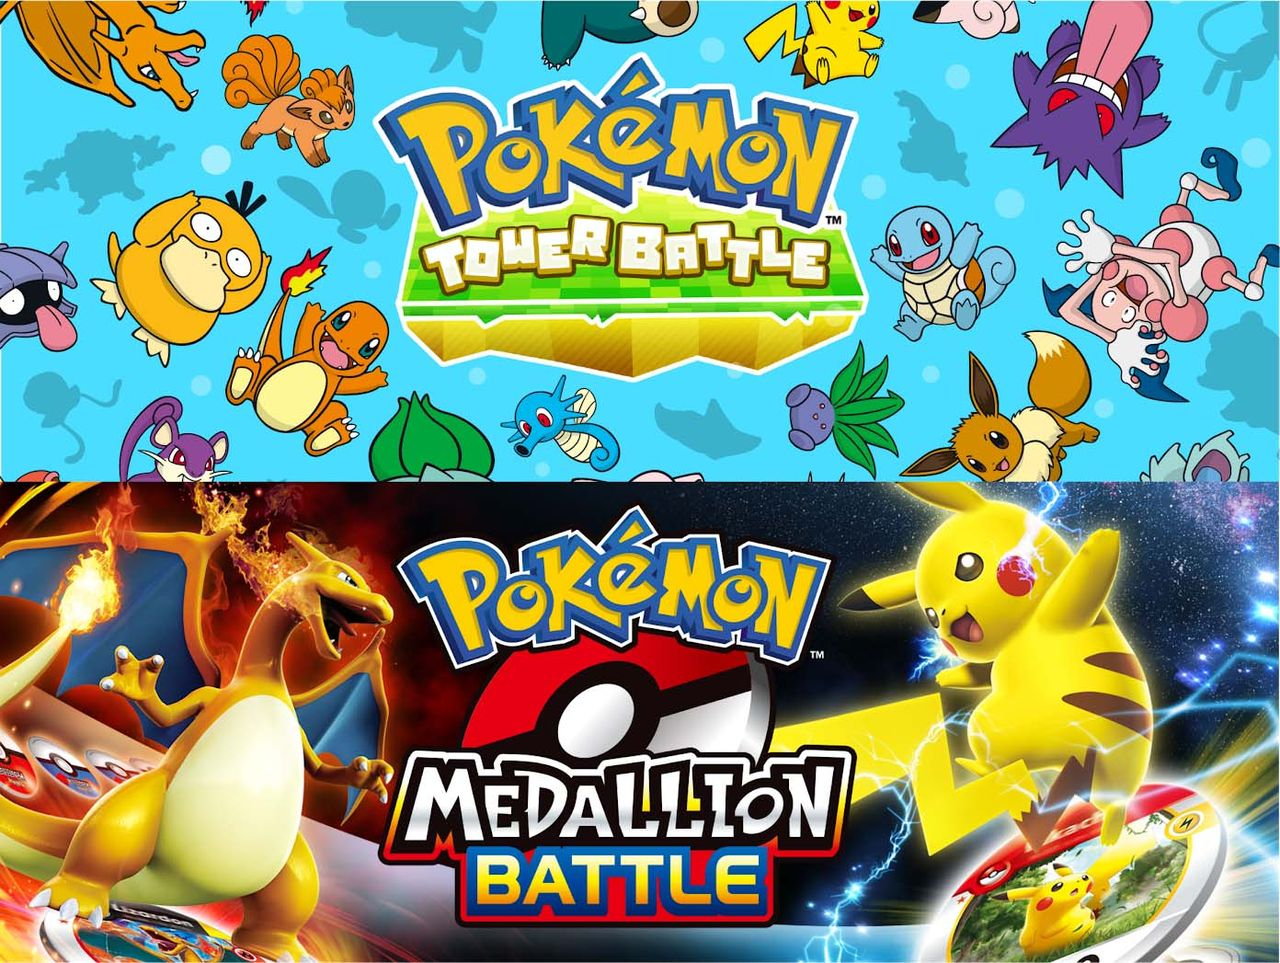 Nu kan du fånga Pokémons på Facebook